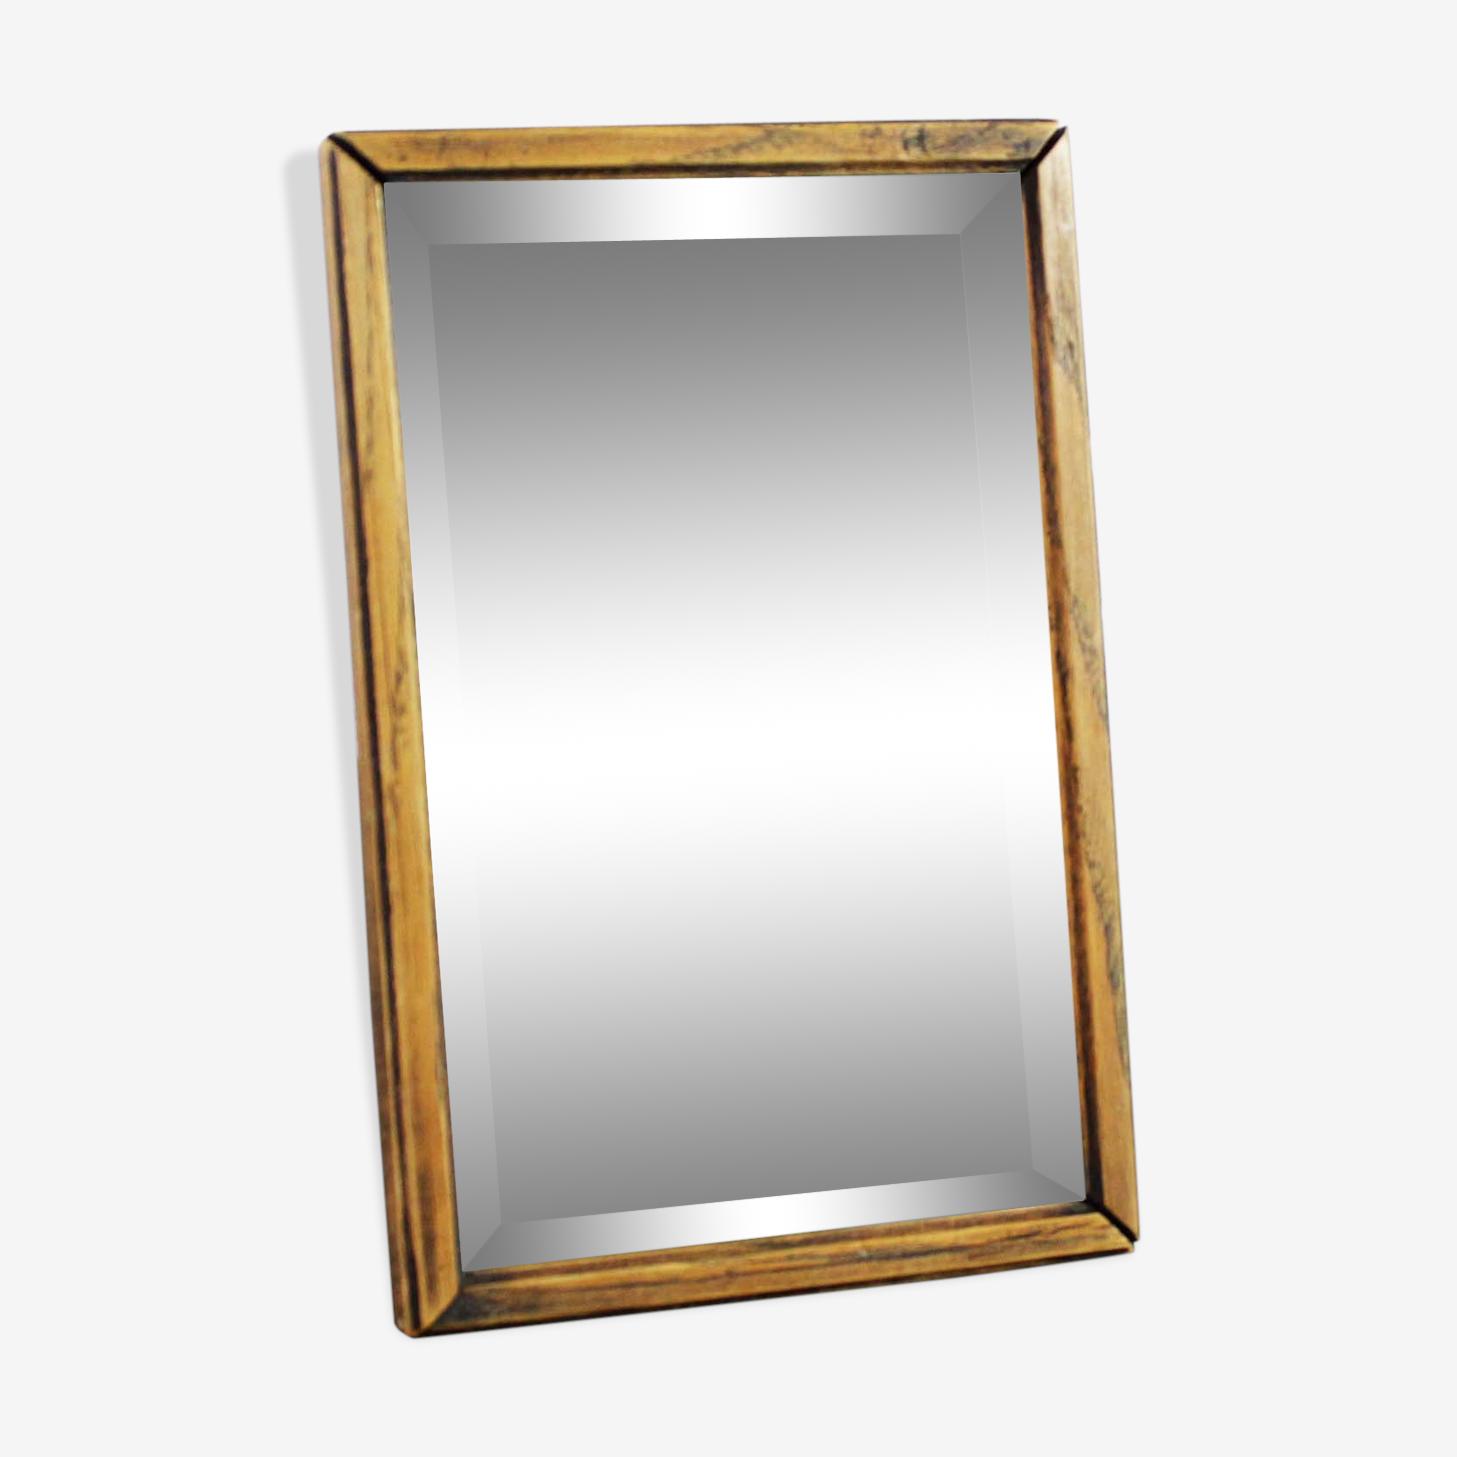 Beveled barber mirror 18x12cm